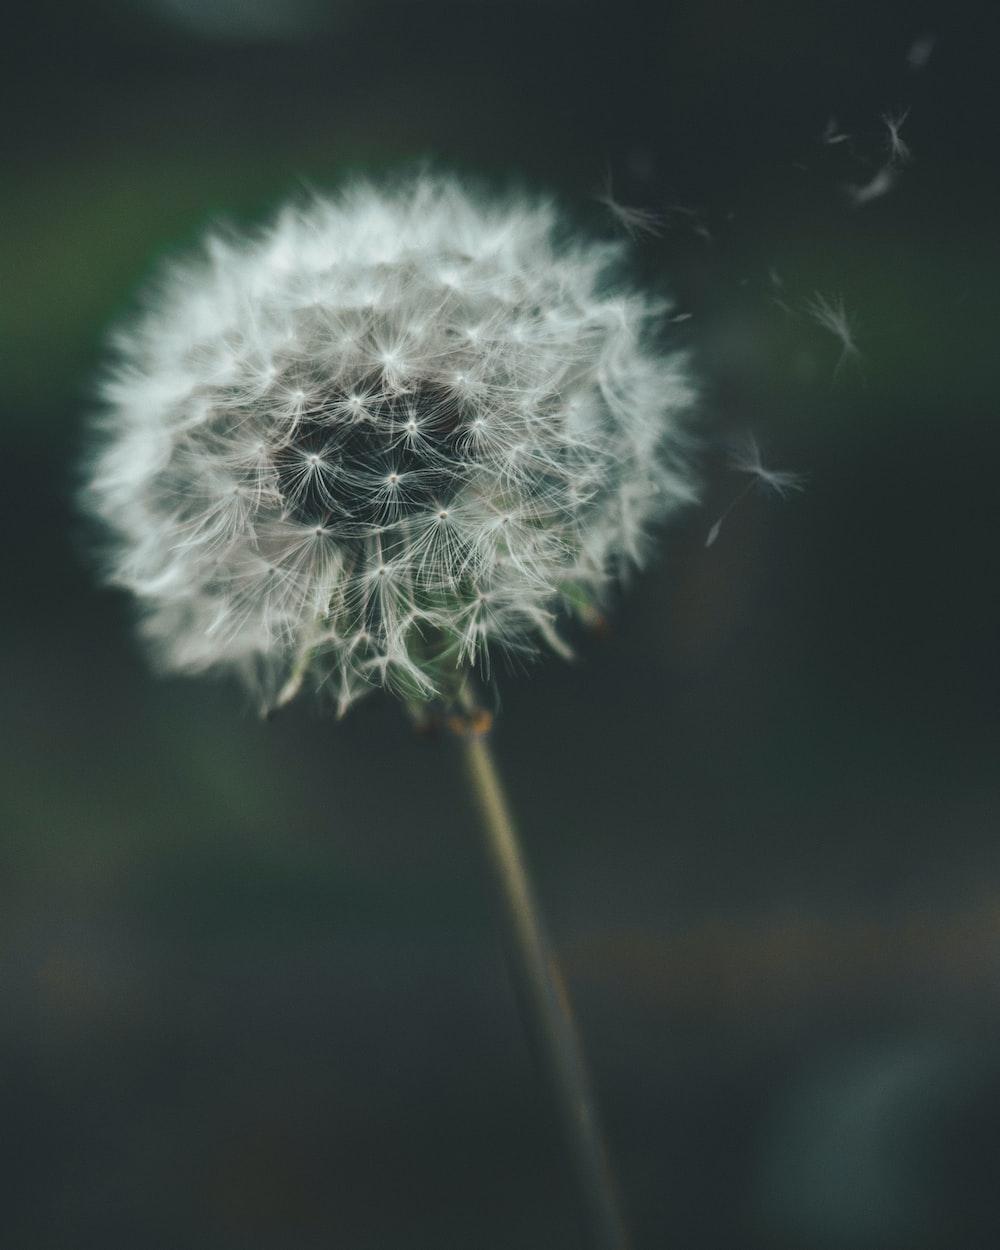 dandelion puff photo by sharon mccutcheon sharonmccutcheon on